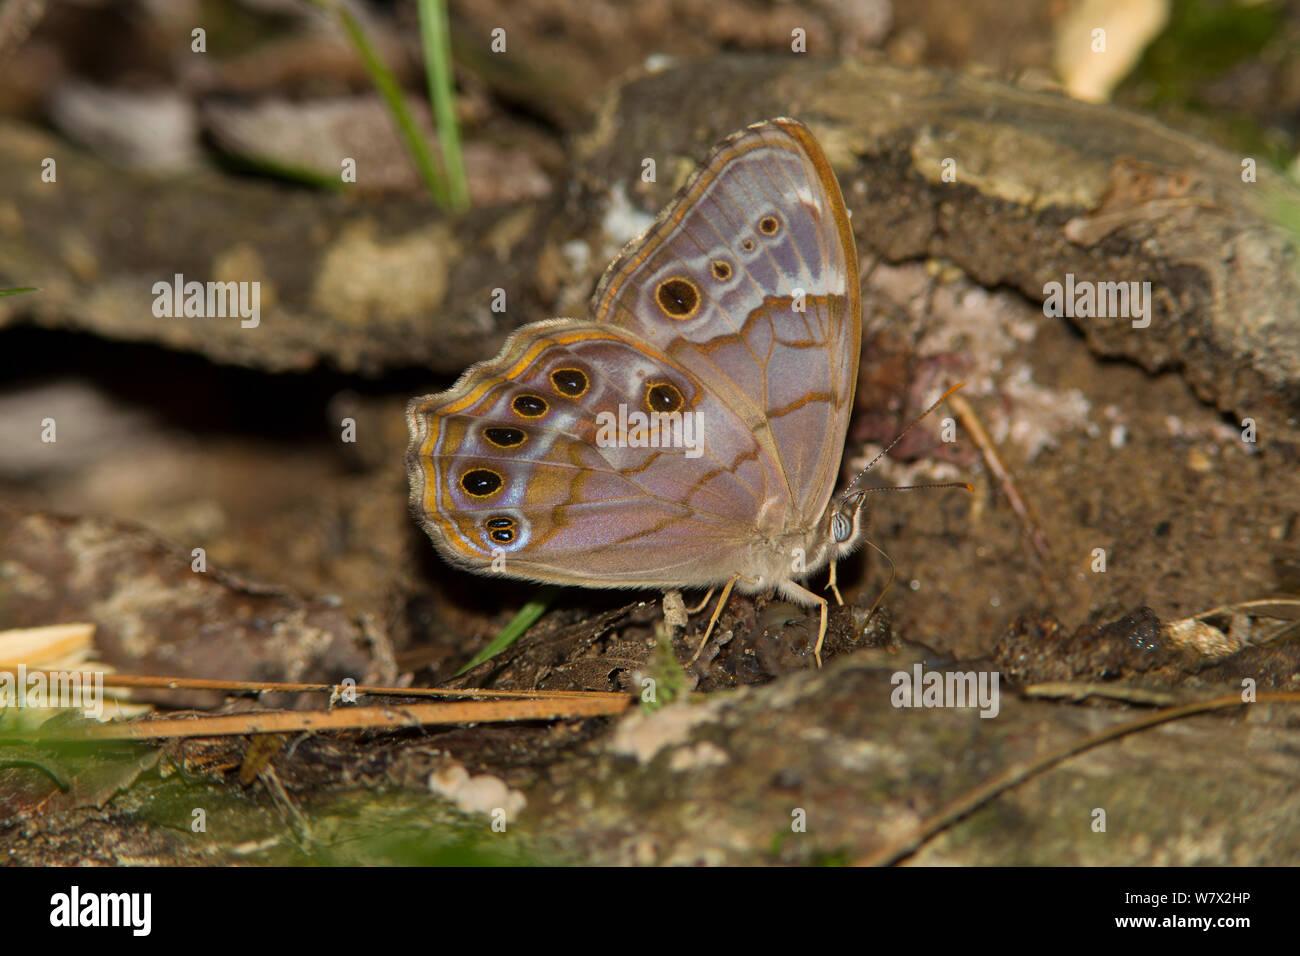 Perla del Sur (Ojo Enodia portlandia) Martin muere Jr State Park, Condado de Jasper, Texas, EE.UU. Foto de stock